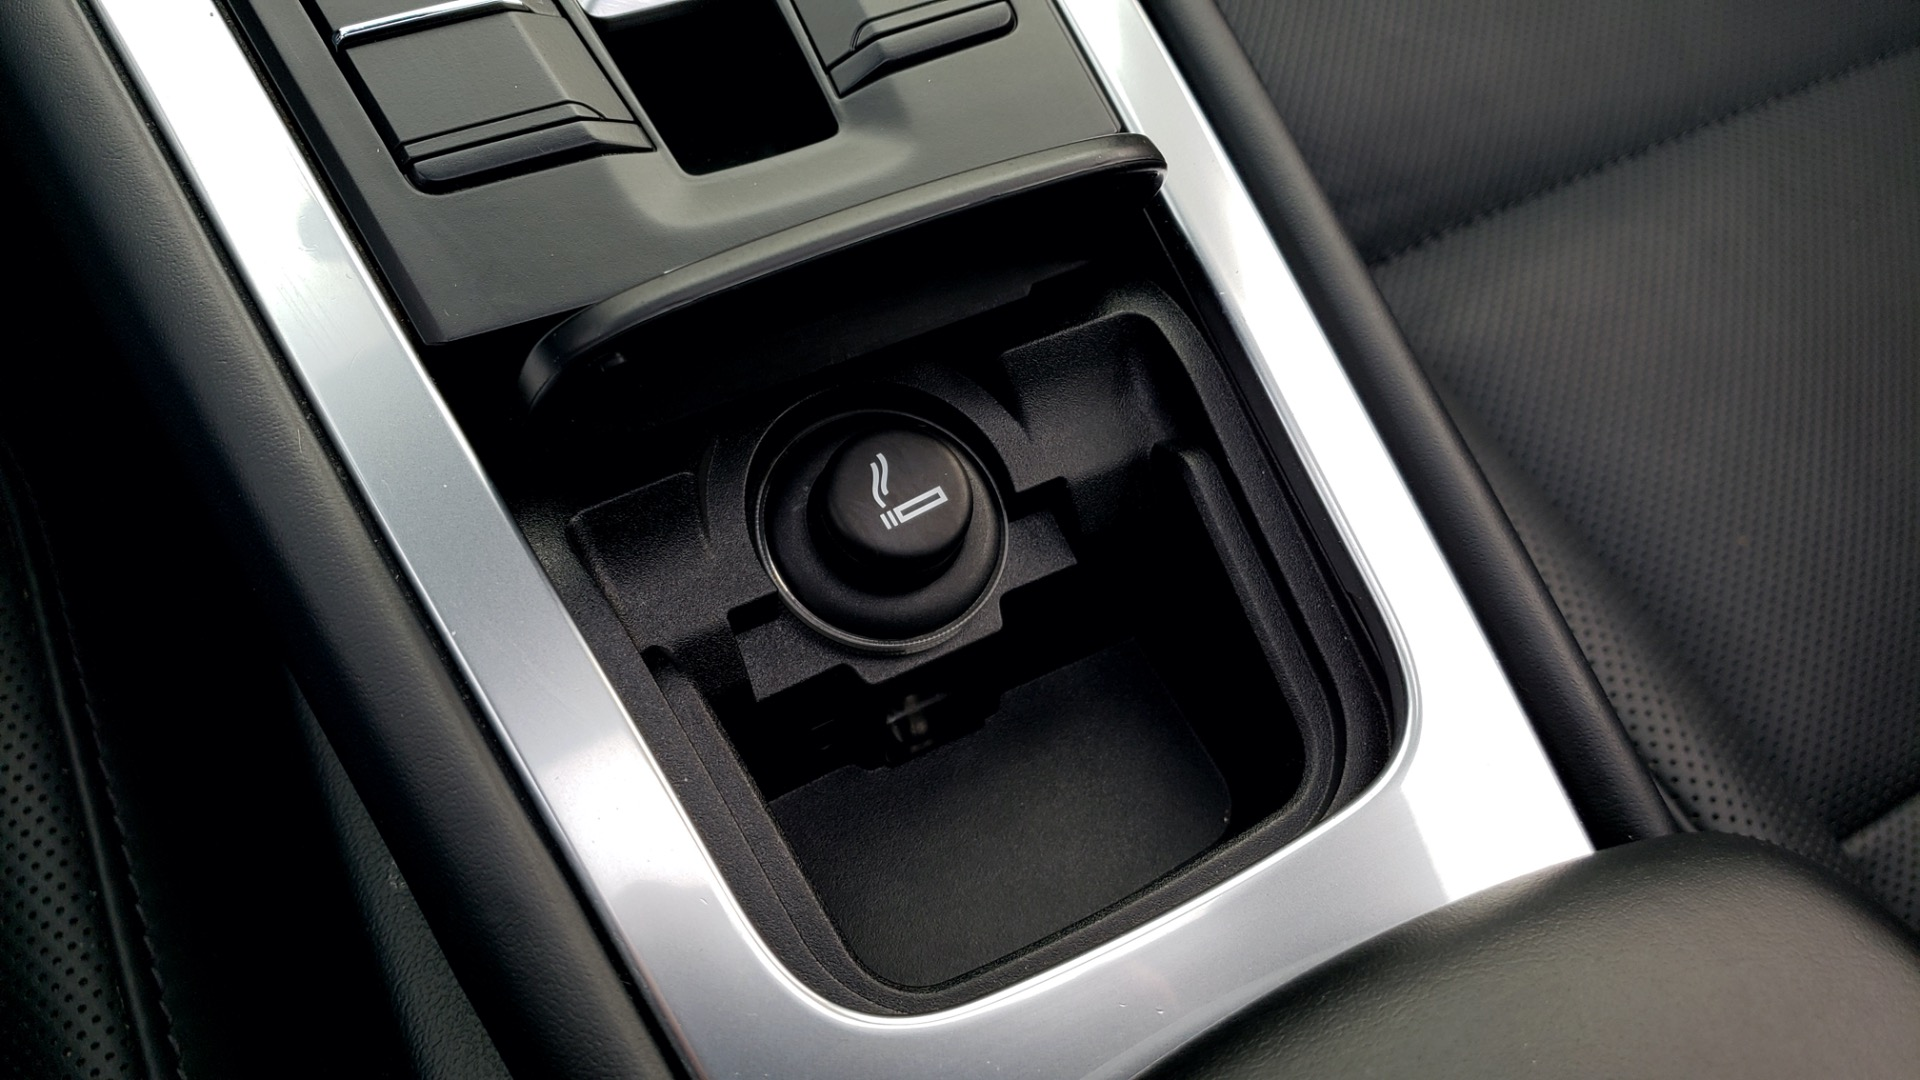 Used 2014 Porsche 911 CARRERA 4S / PREM PKG PLUS / NAV / SUNROO / BOSE / CHRONO for sale Sold at Formula Imports in Charlotte NC 28227 59